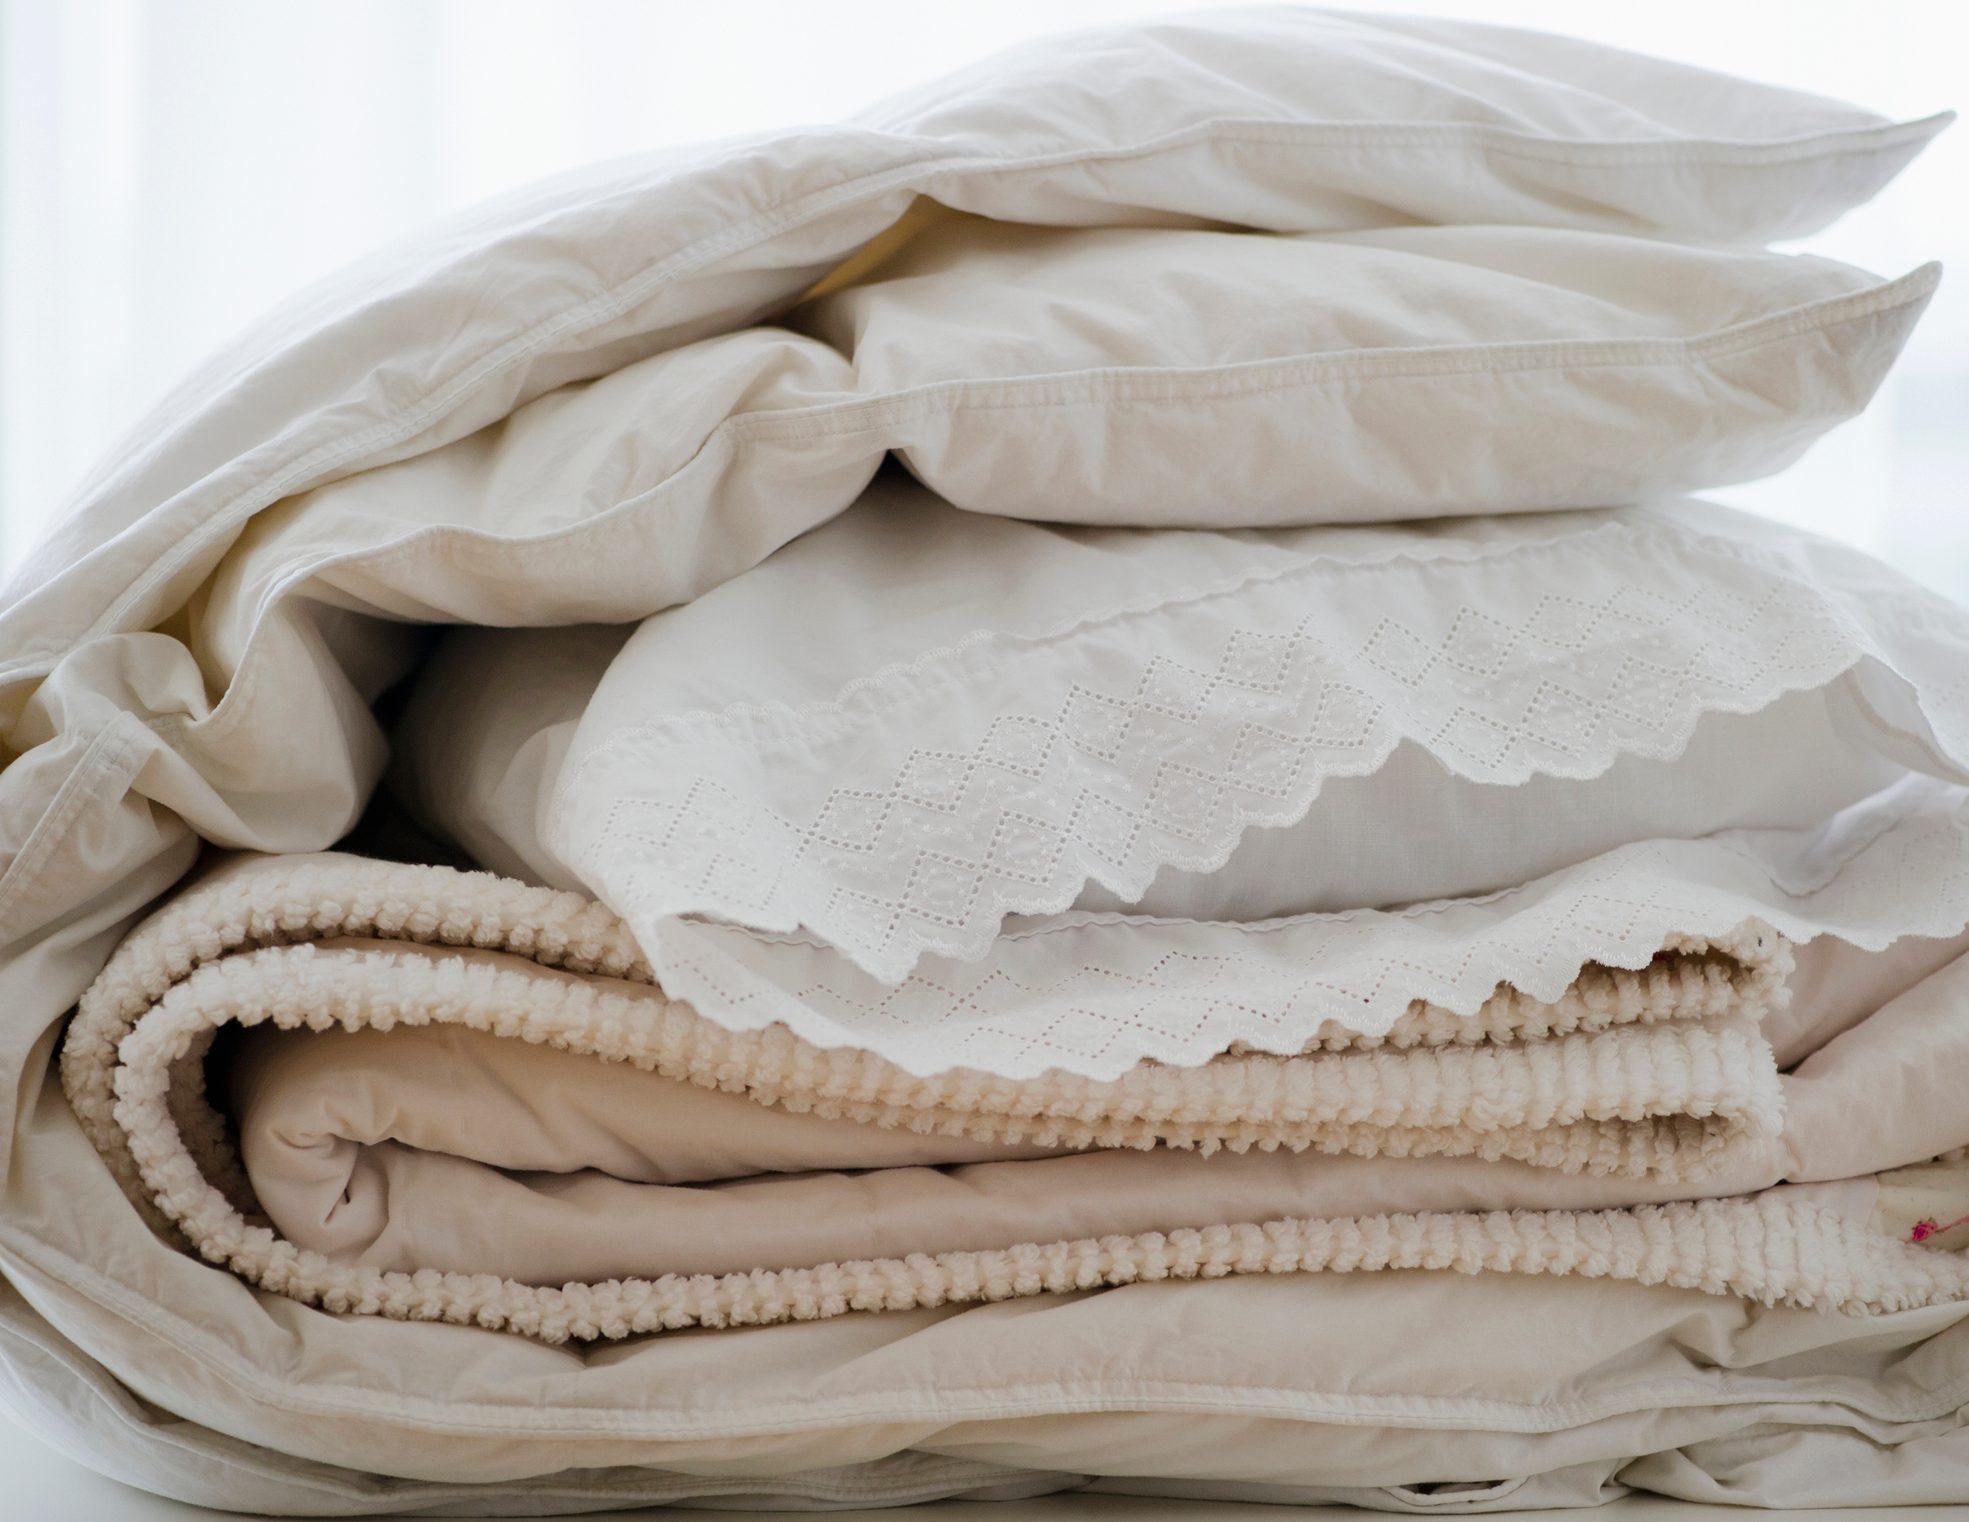 folded bedding